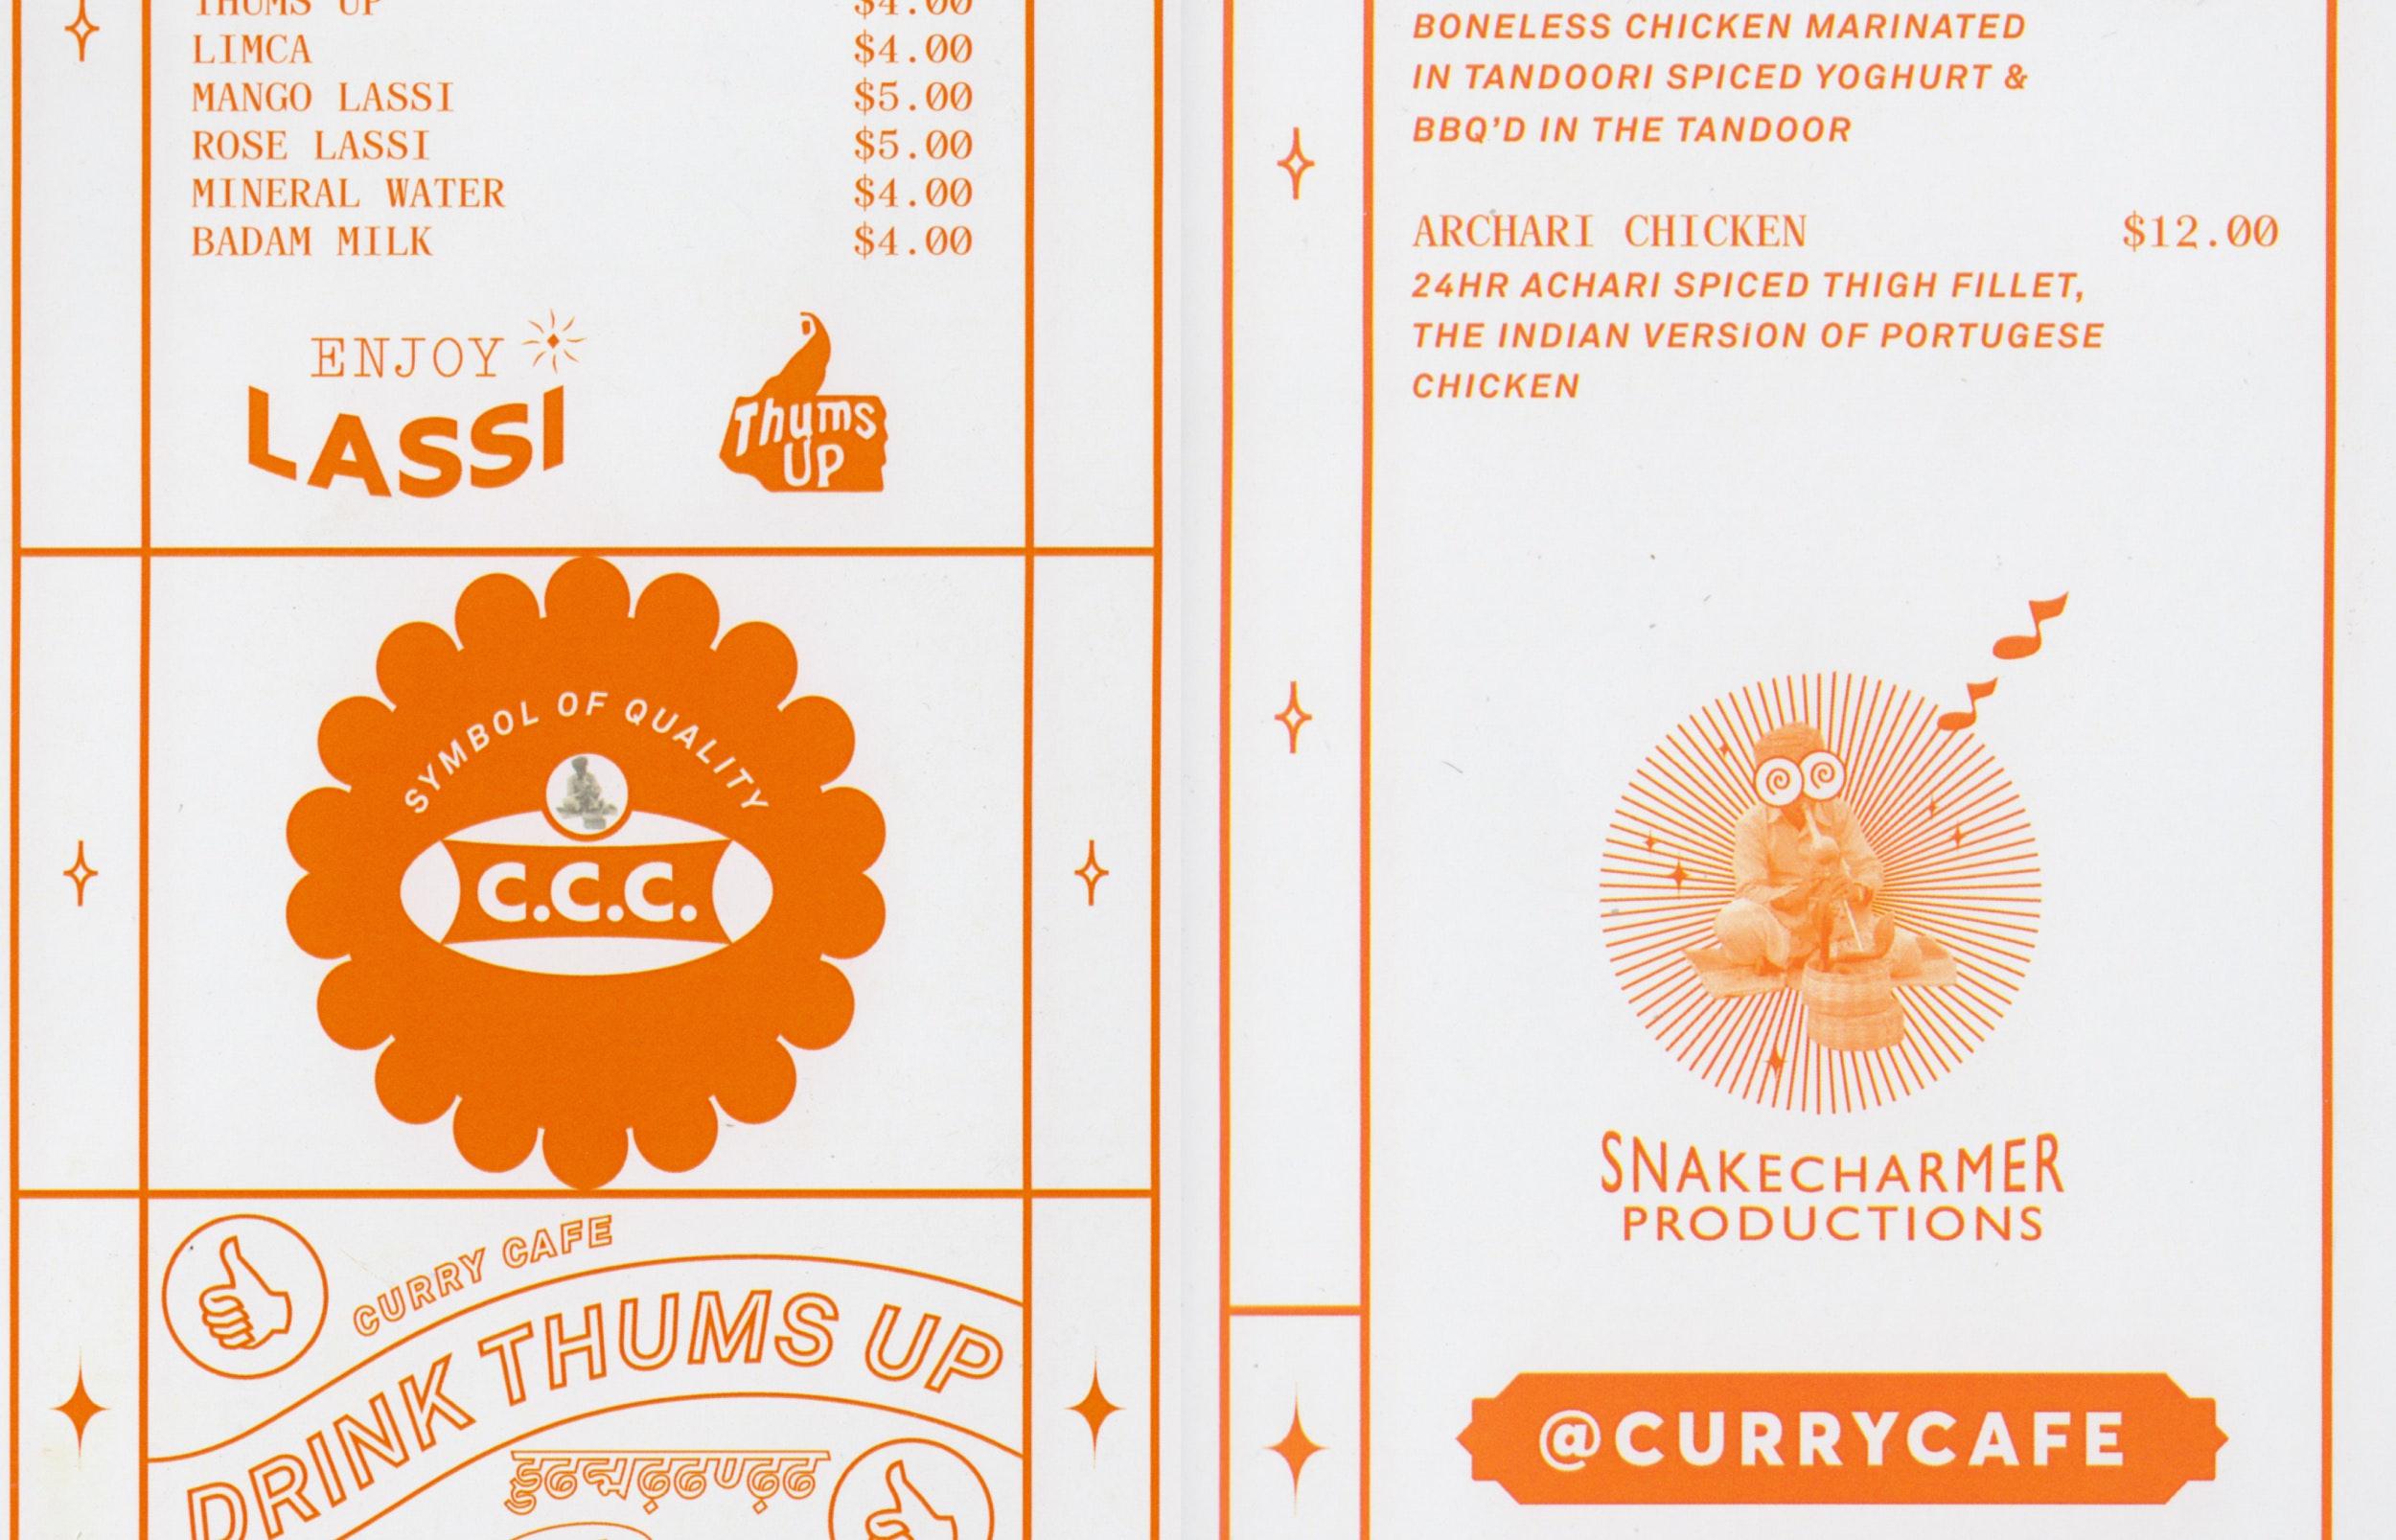 Curry Cafe Flemington 3 fold a4 take-away menu designed by More Studio